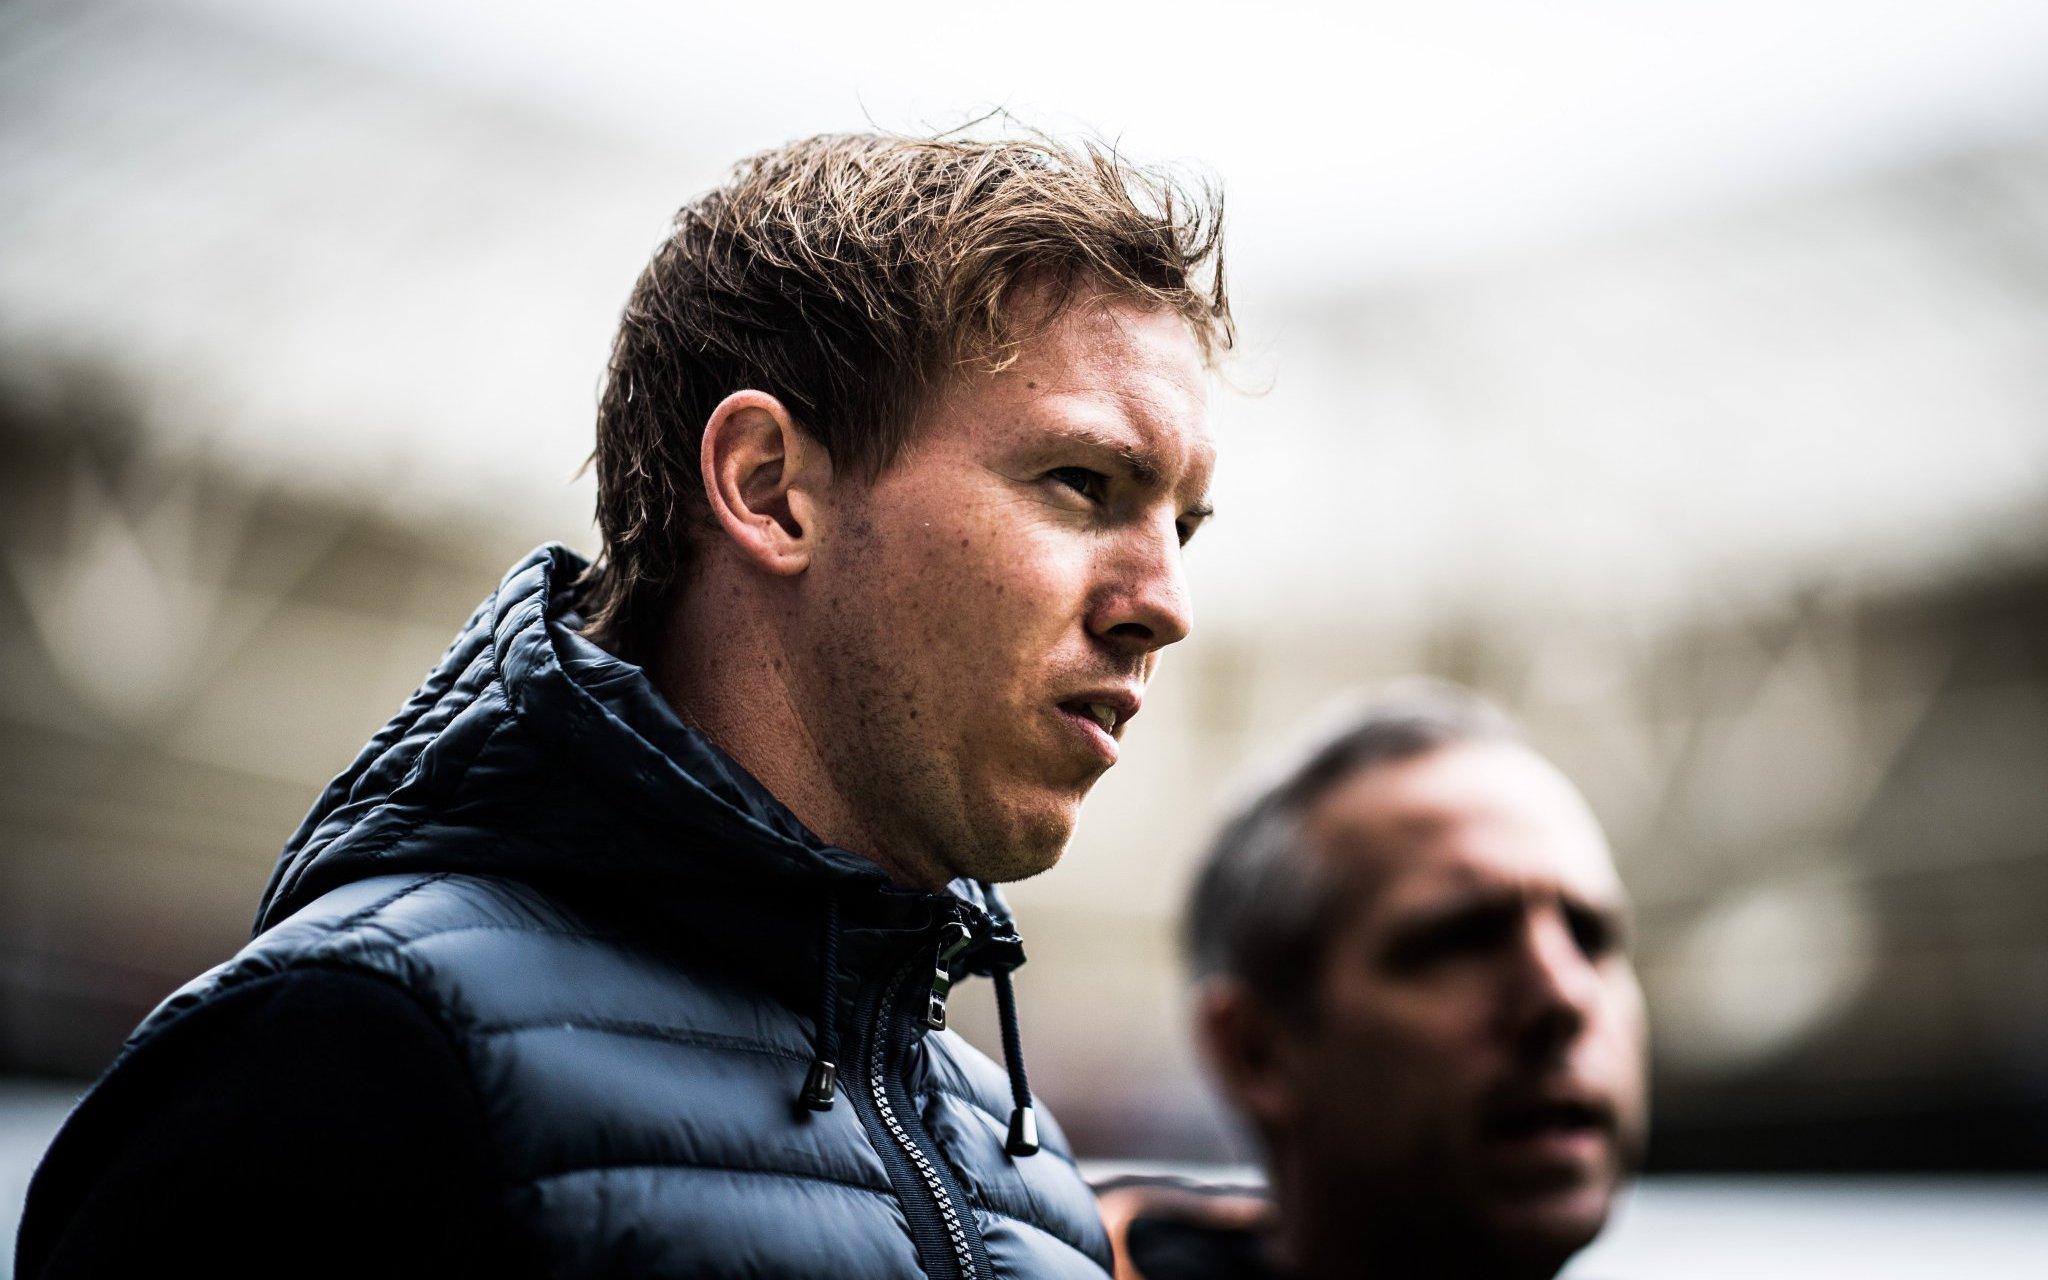 Julian Nagelsmann anuncia que vai deixar o comando técnico do Hoffenheim no final da temporada 2018/19. https://t.co/C9MCpqdGqa